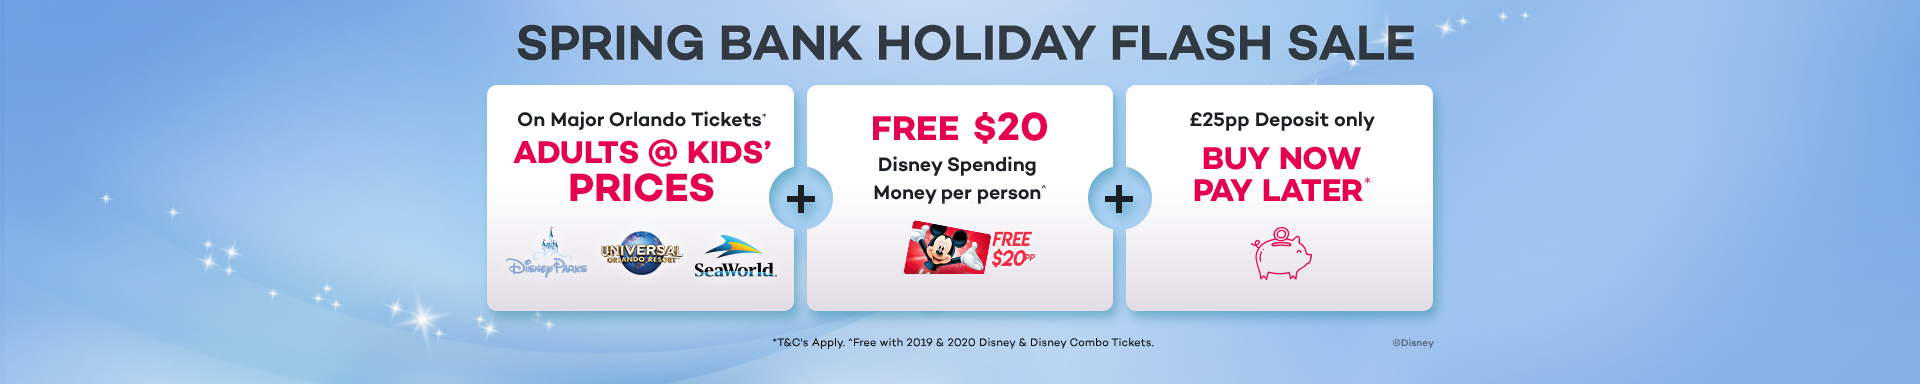 Spring Bank Holiday Flash Sale